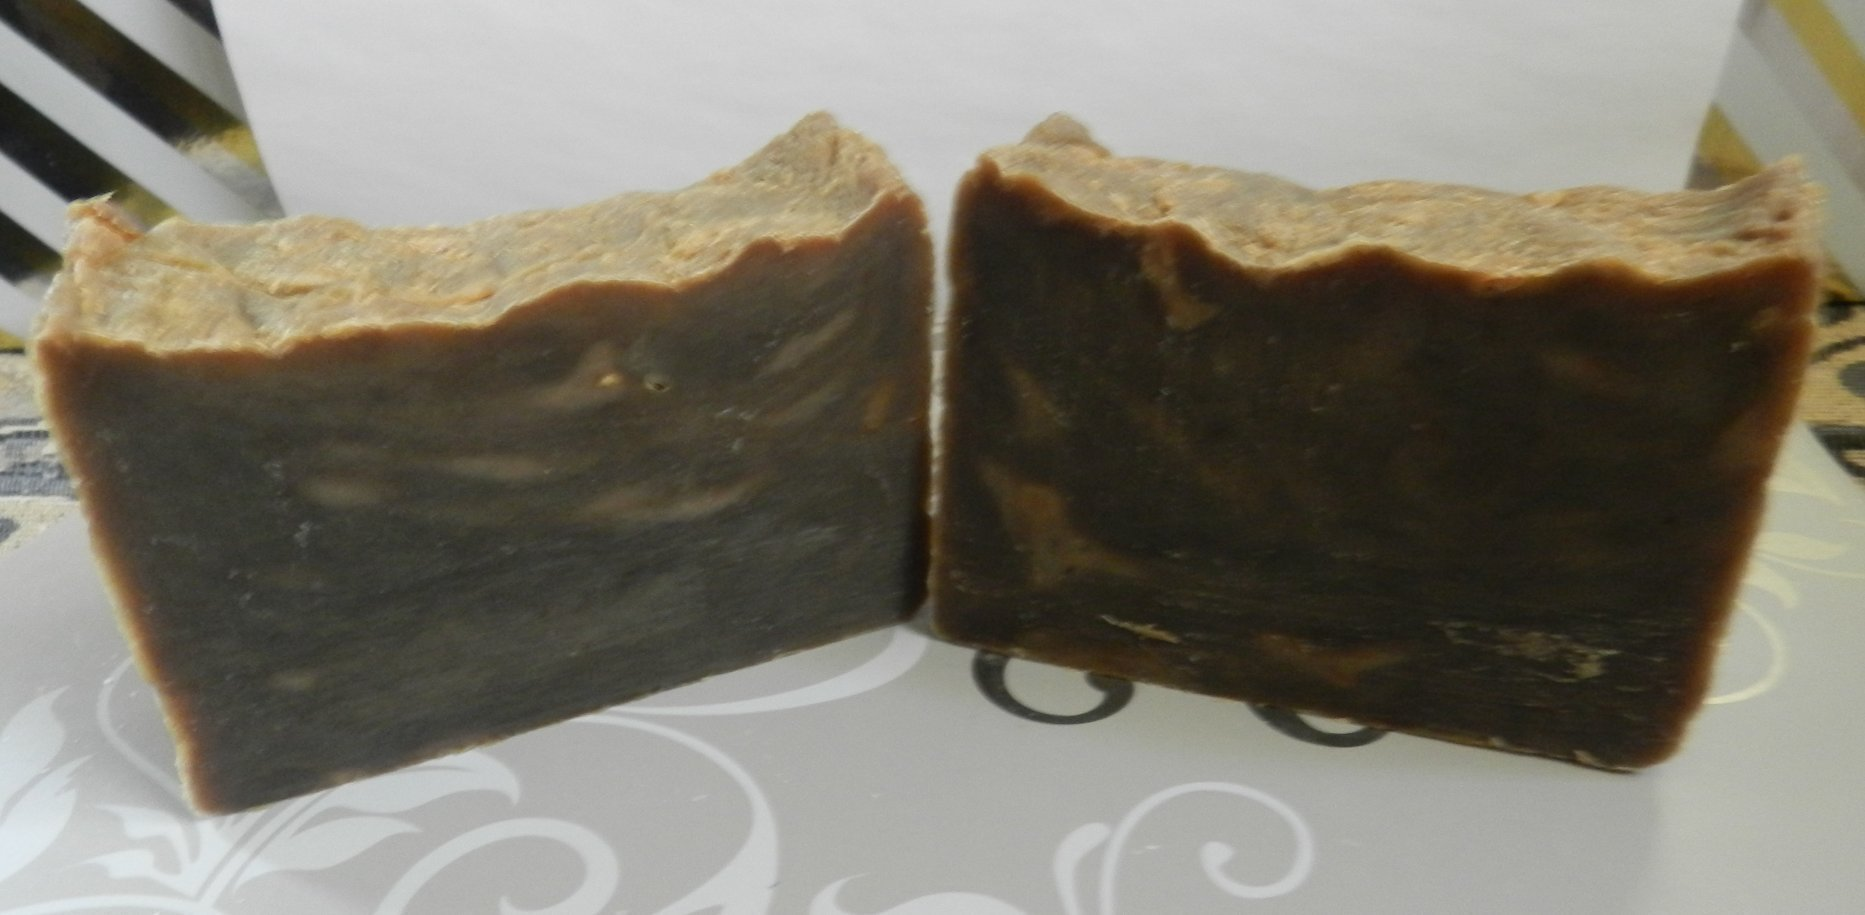 Pine Tar Soap Two Bars. Traditional Handmade Lard and Lye Soap with 11% Closed Kiln Pine Tar Eczema Psoriasis Scent Masking Pregnancy Rash Primitive Rustic